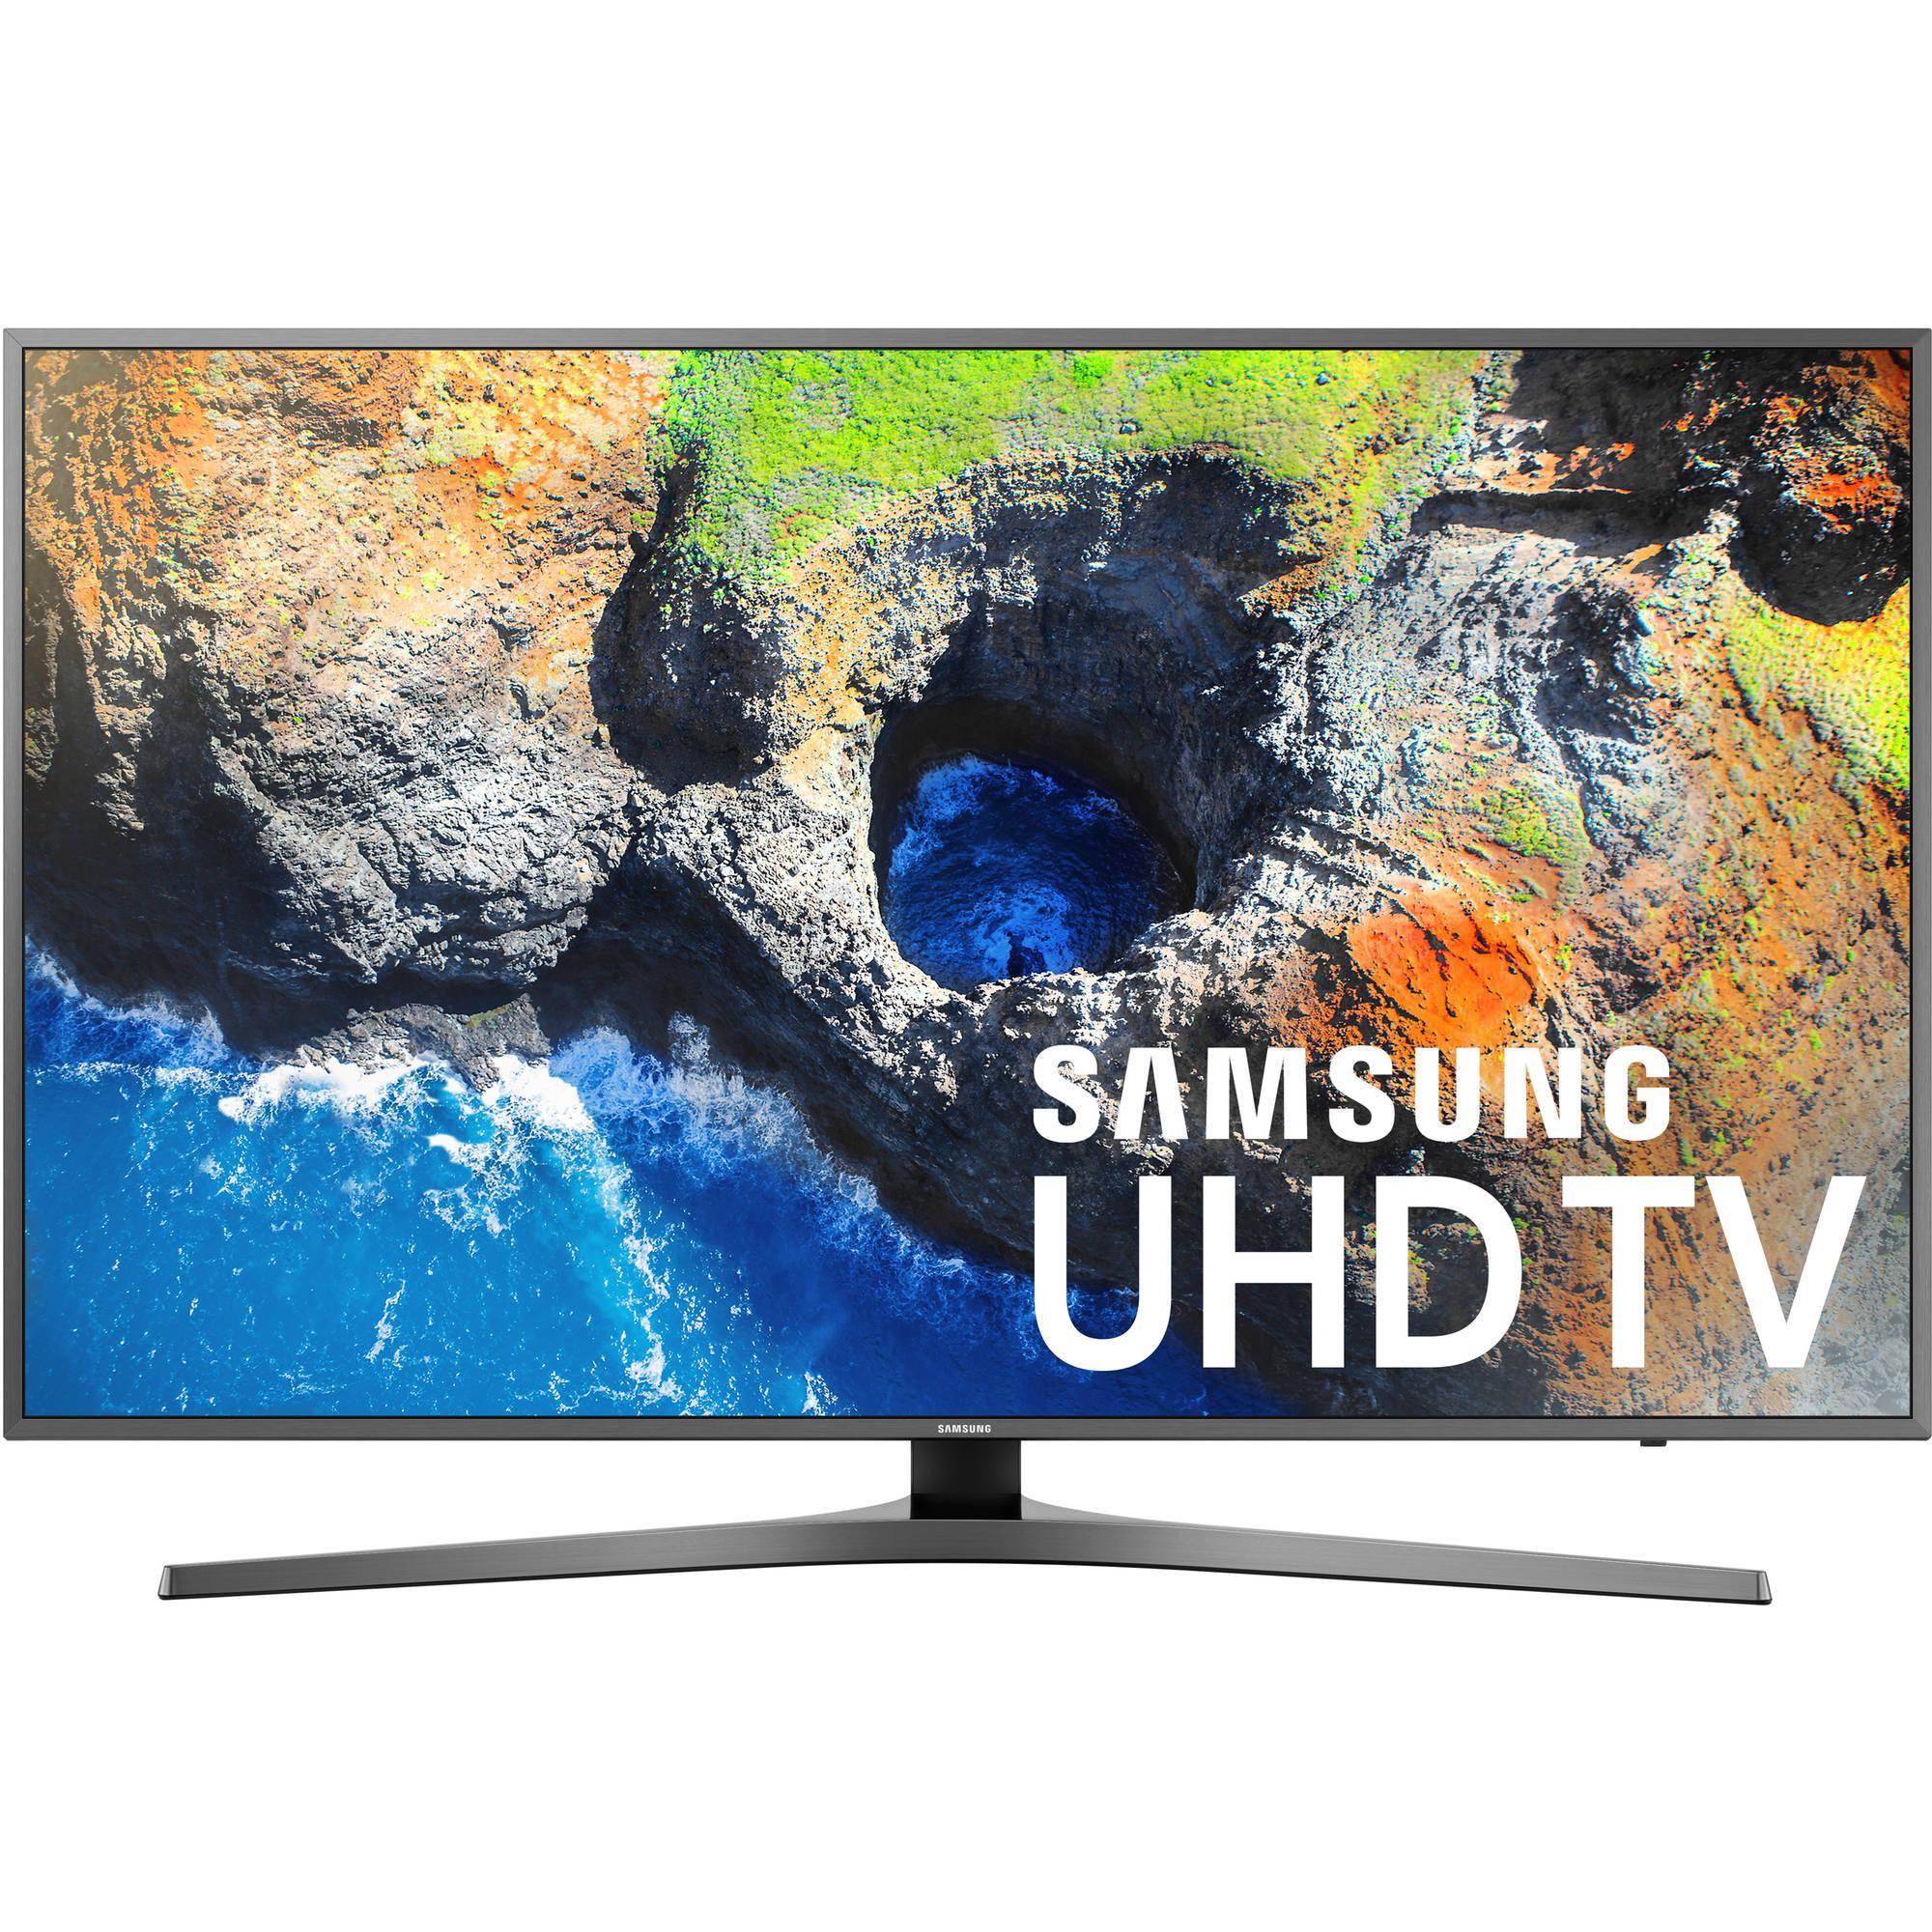 "Samsung 49"" Class 4K (2160P) Ultra HD Smart LED TV (UN49MU7000FXZA)"